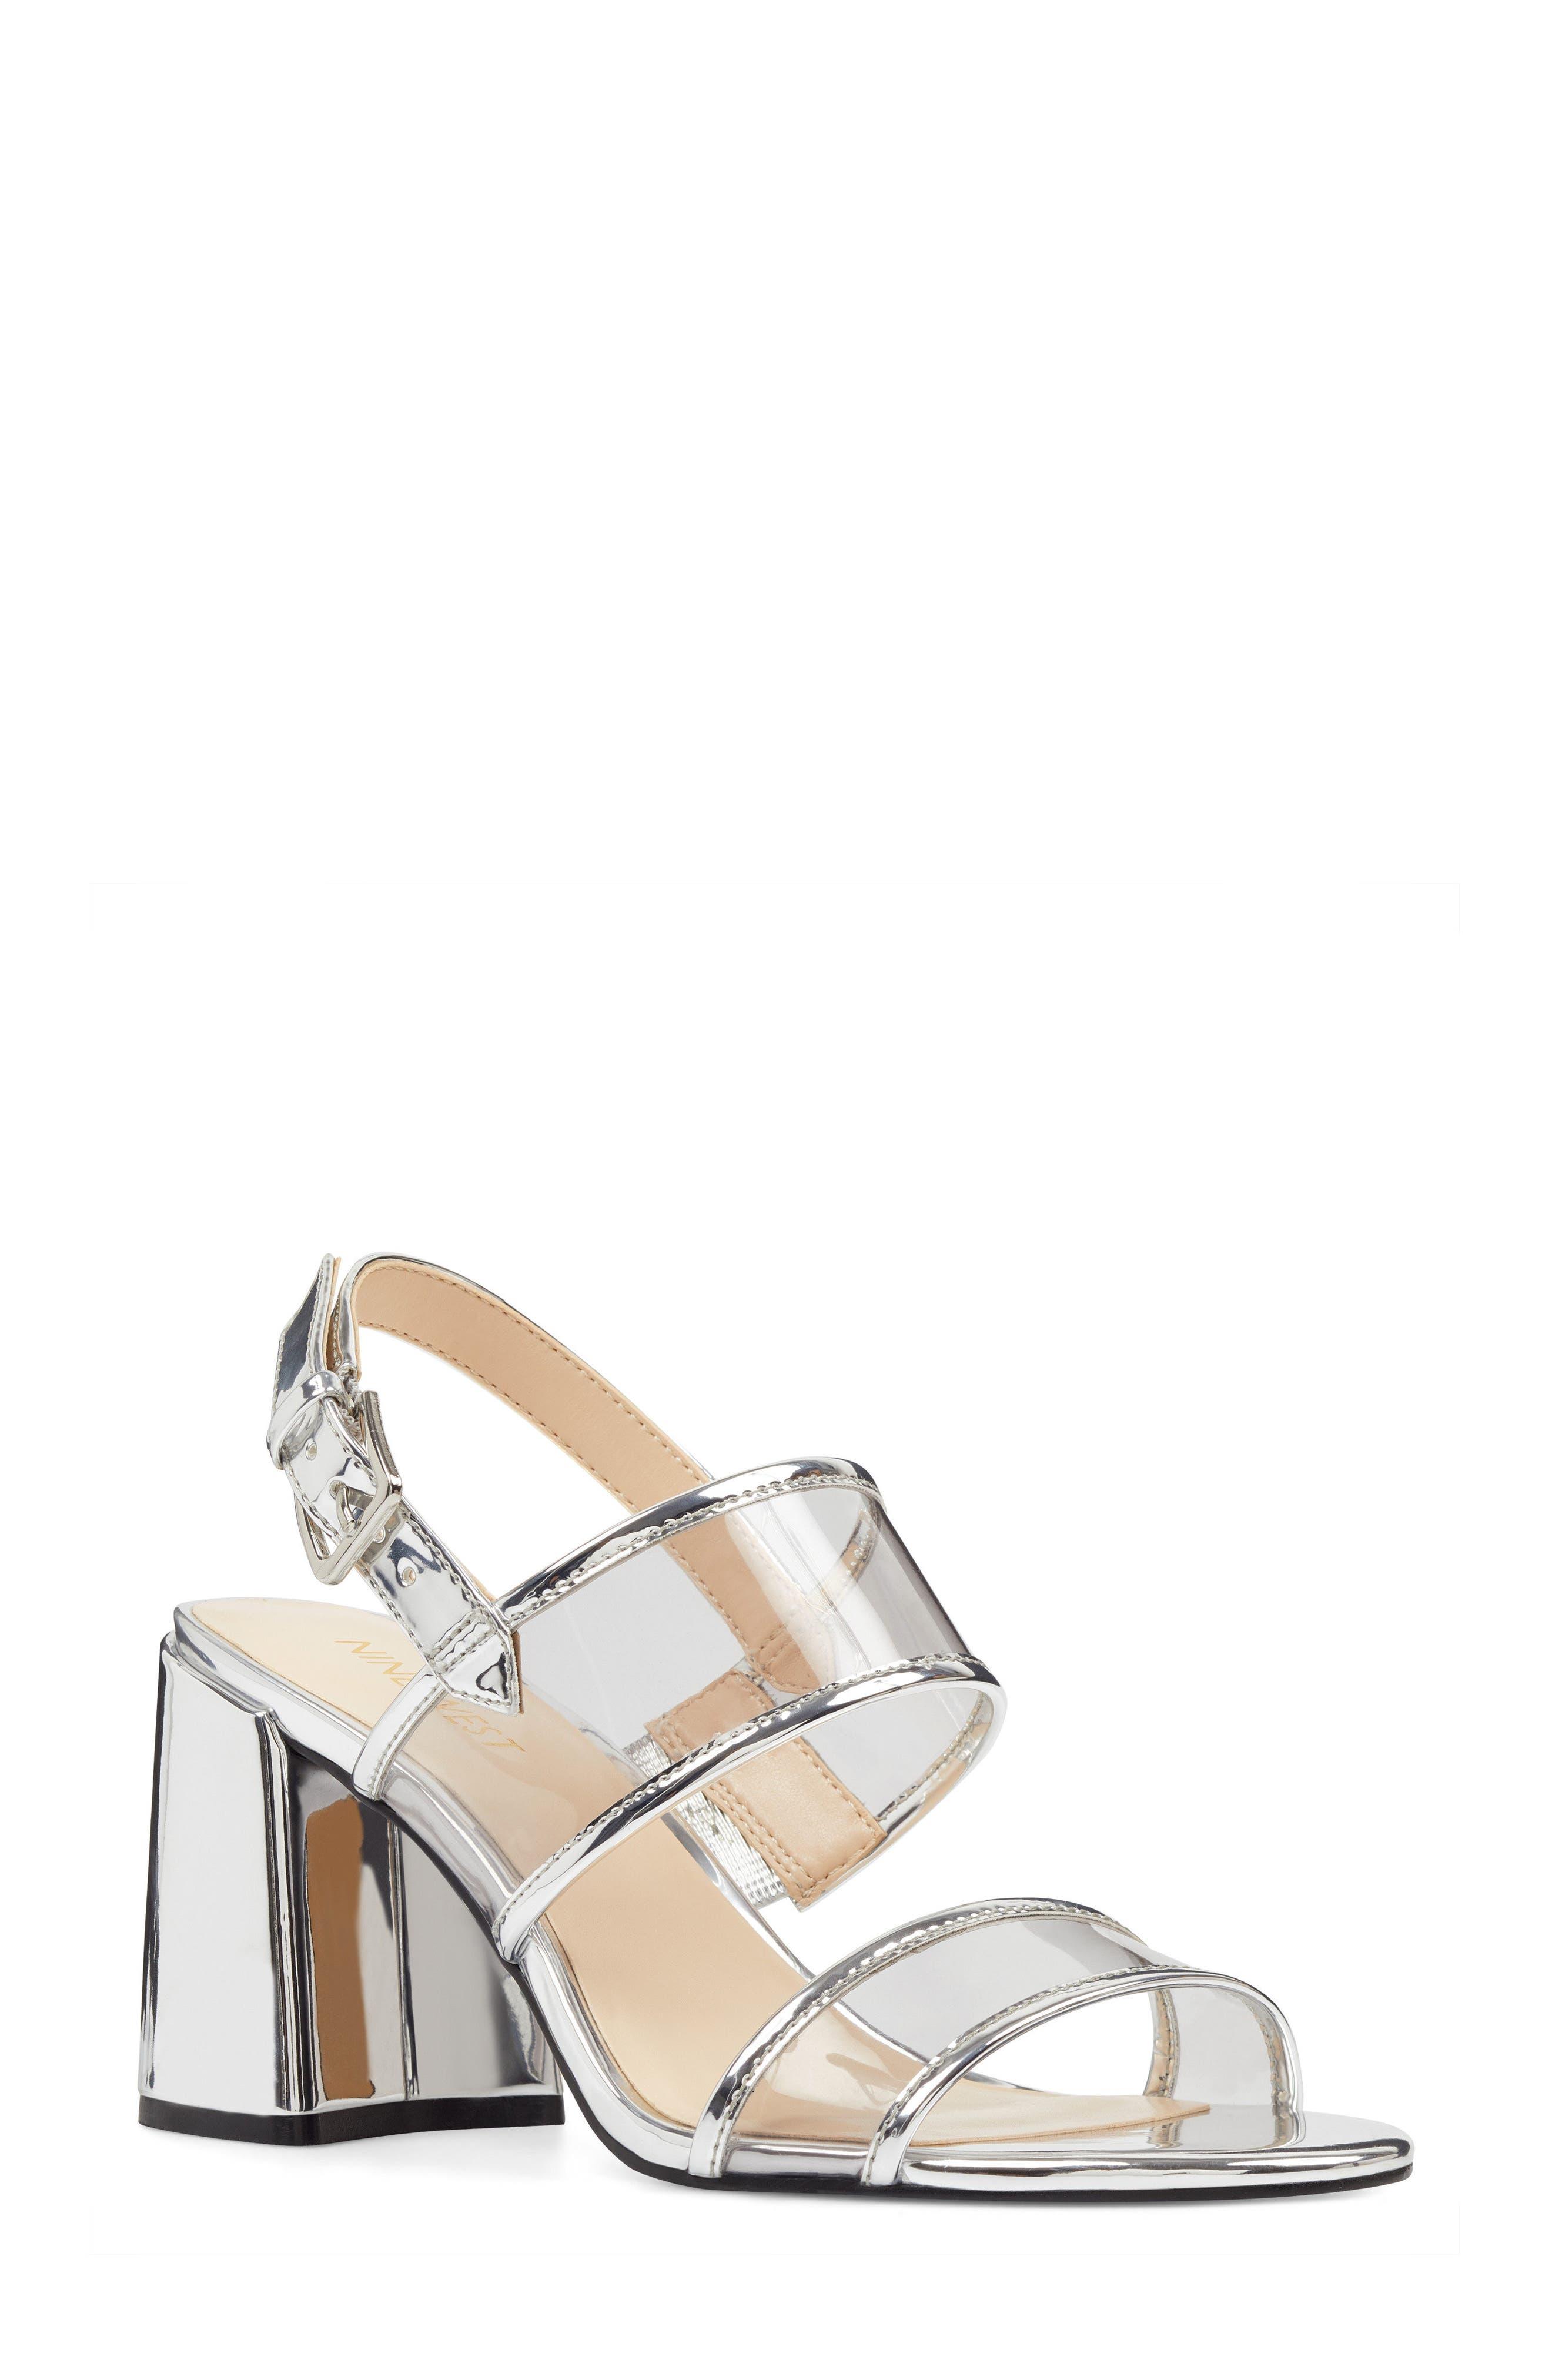 Gourdes Block Heel Sandal,                         Main,                         color, 021